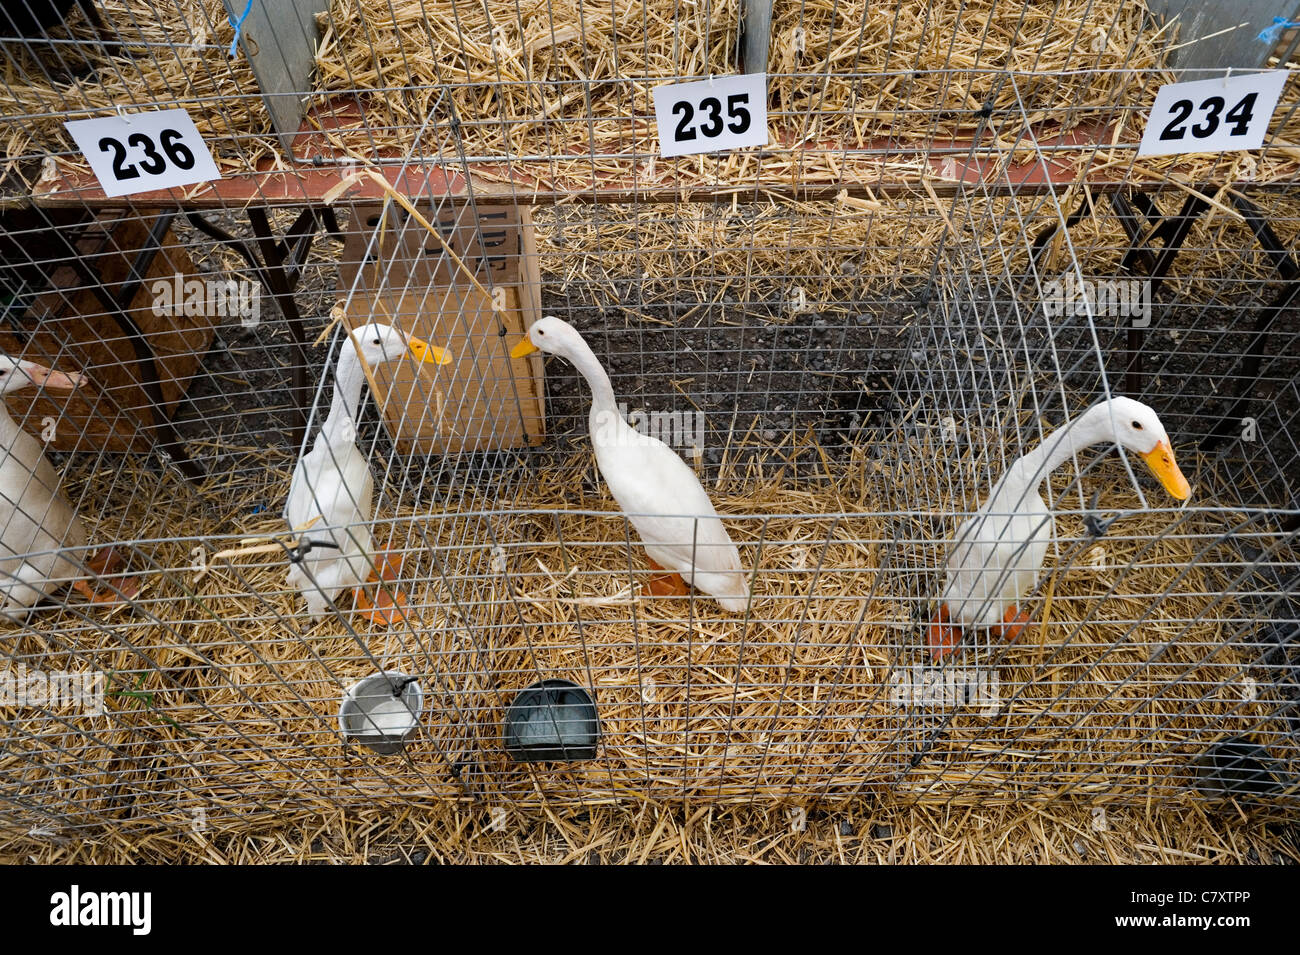 Aylesbury ducks at the Devon County Show, Wespoint, Exeter, Devon UK. - Stock Image